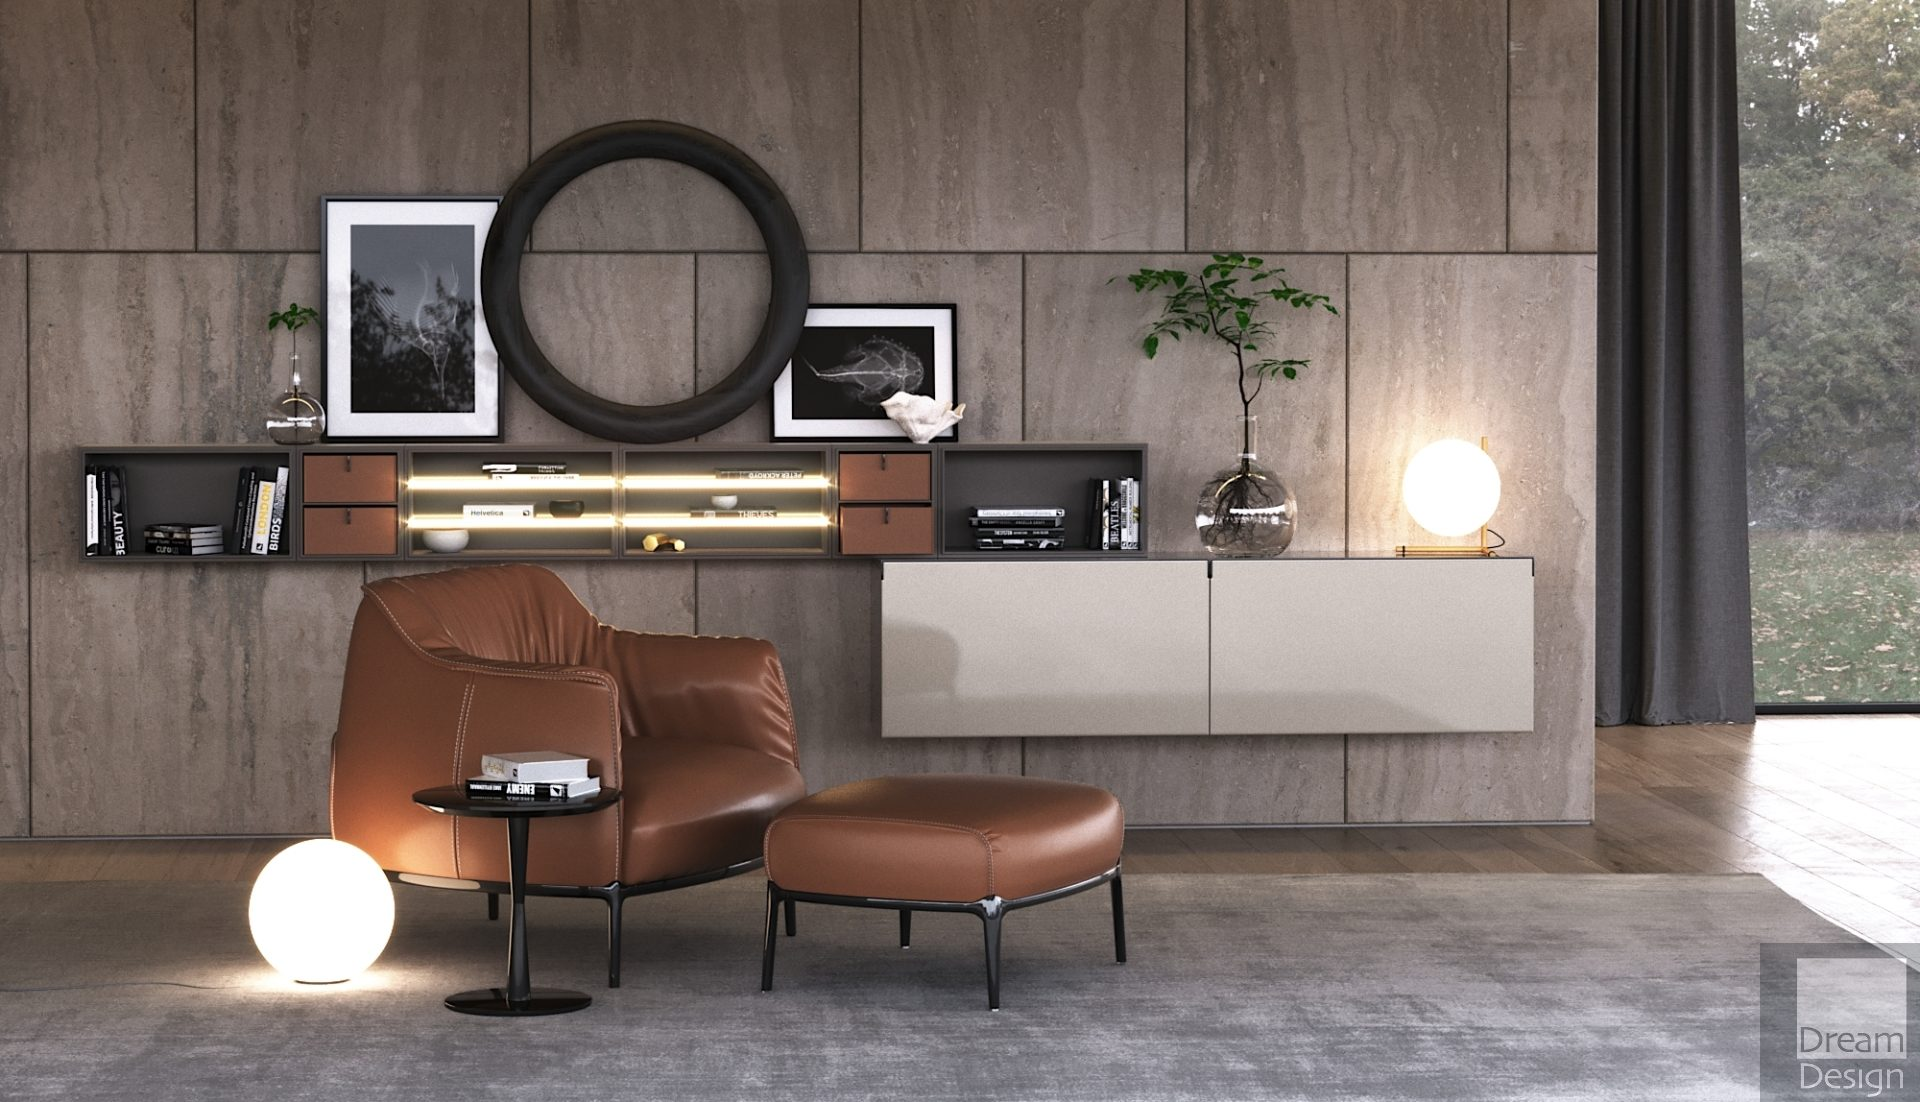 Poltrona Frau Archibald Armchair - Dream Design Interiors Ltd